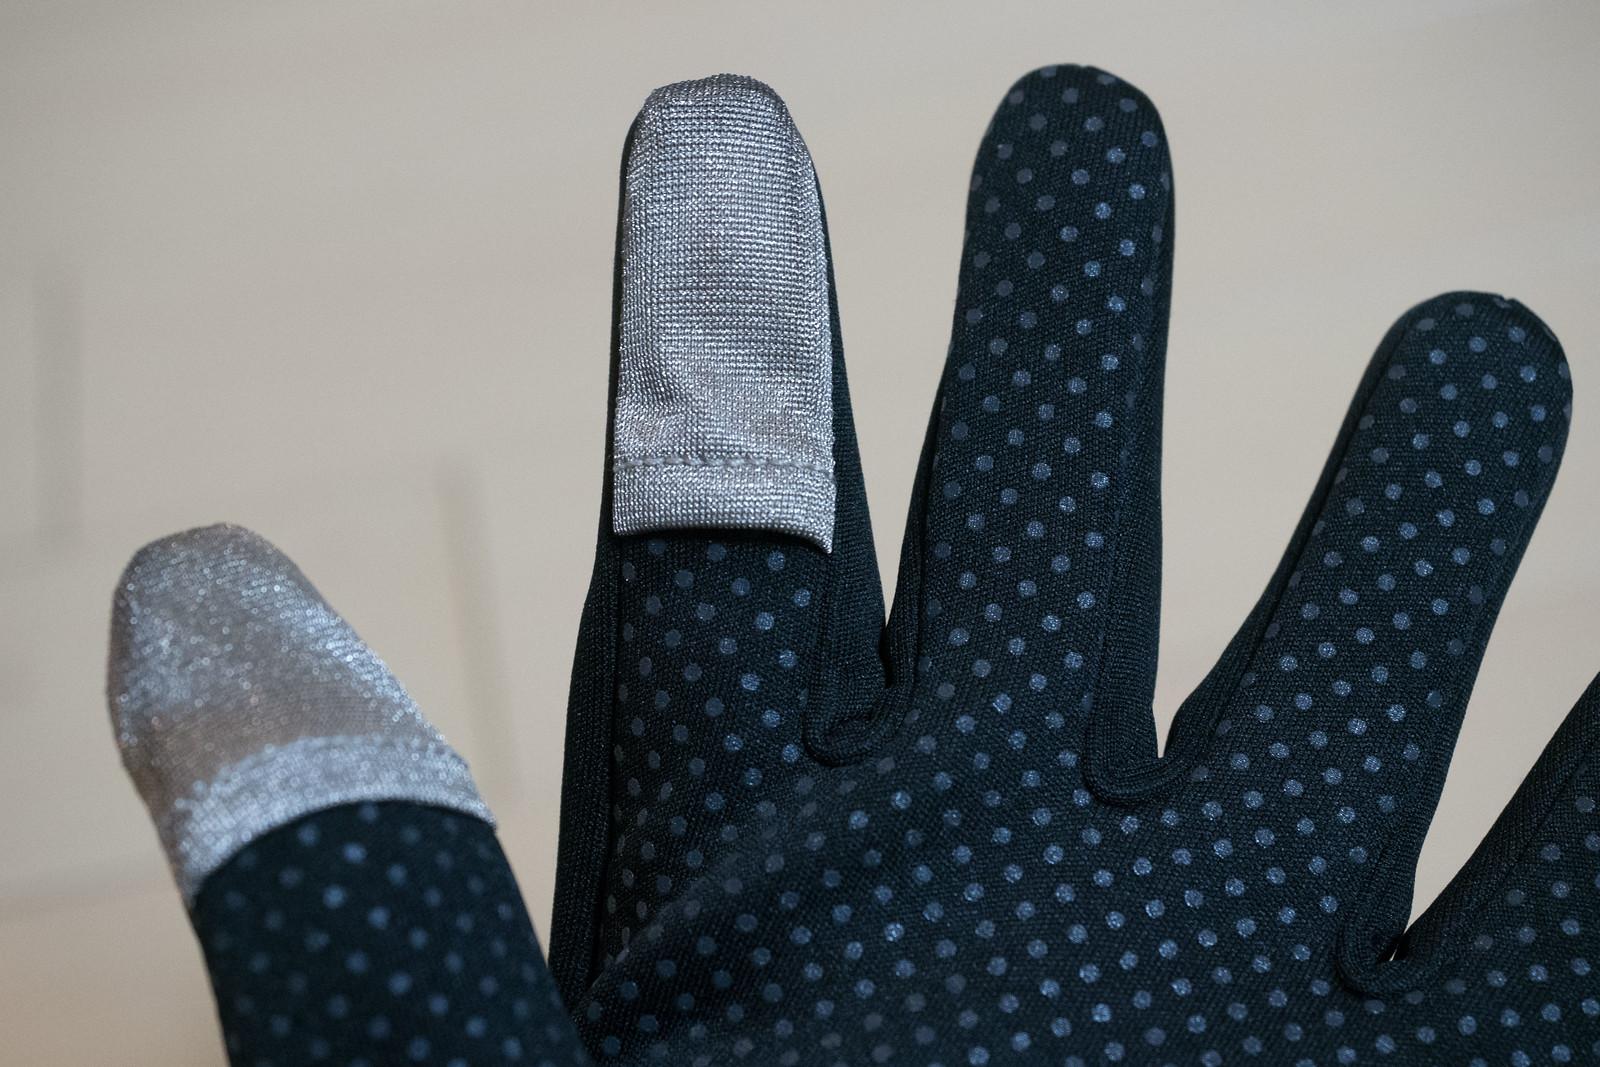 LowePro_Photo_Glove-4